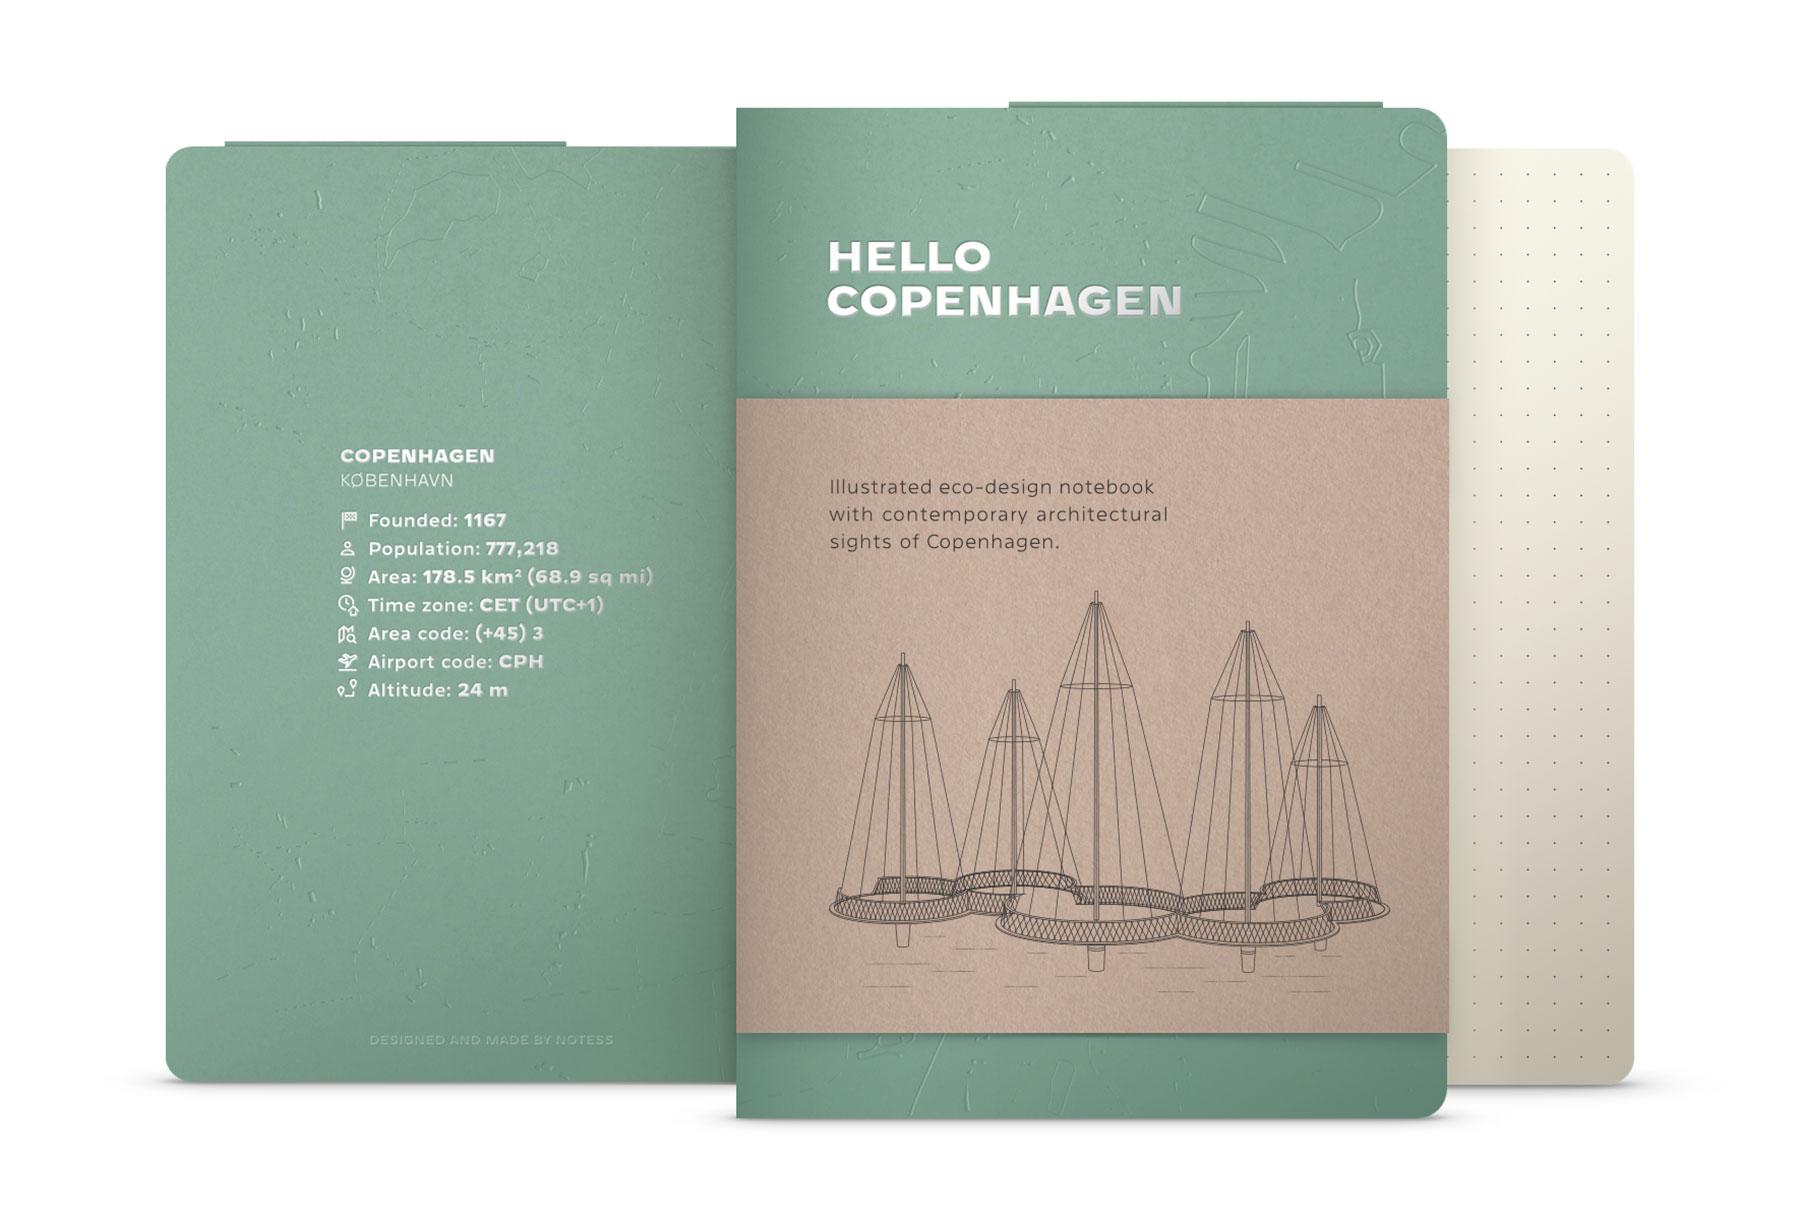 Hello-Copenhagen-Notebook-Mint-Green-Product-02.jpg